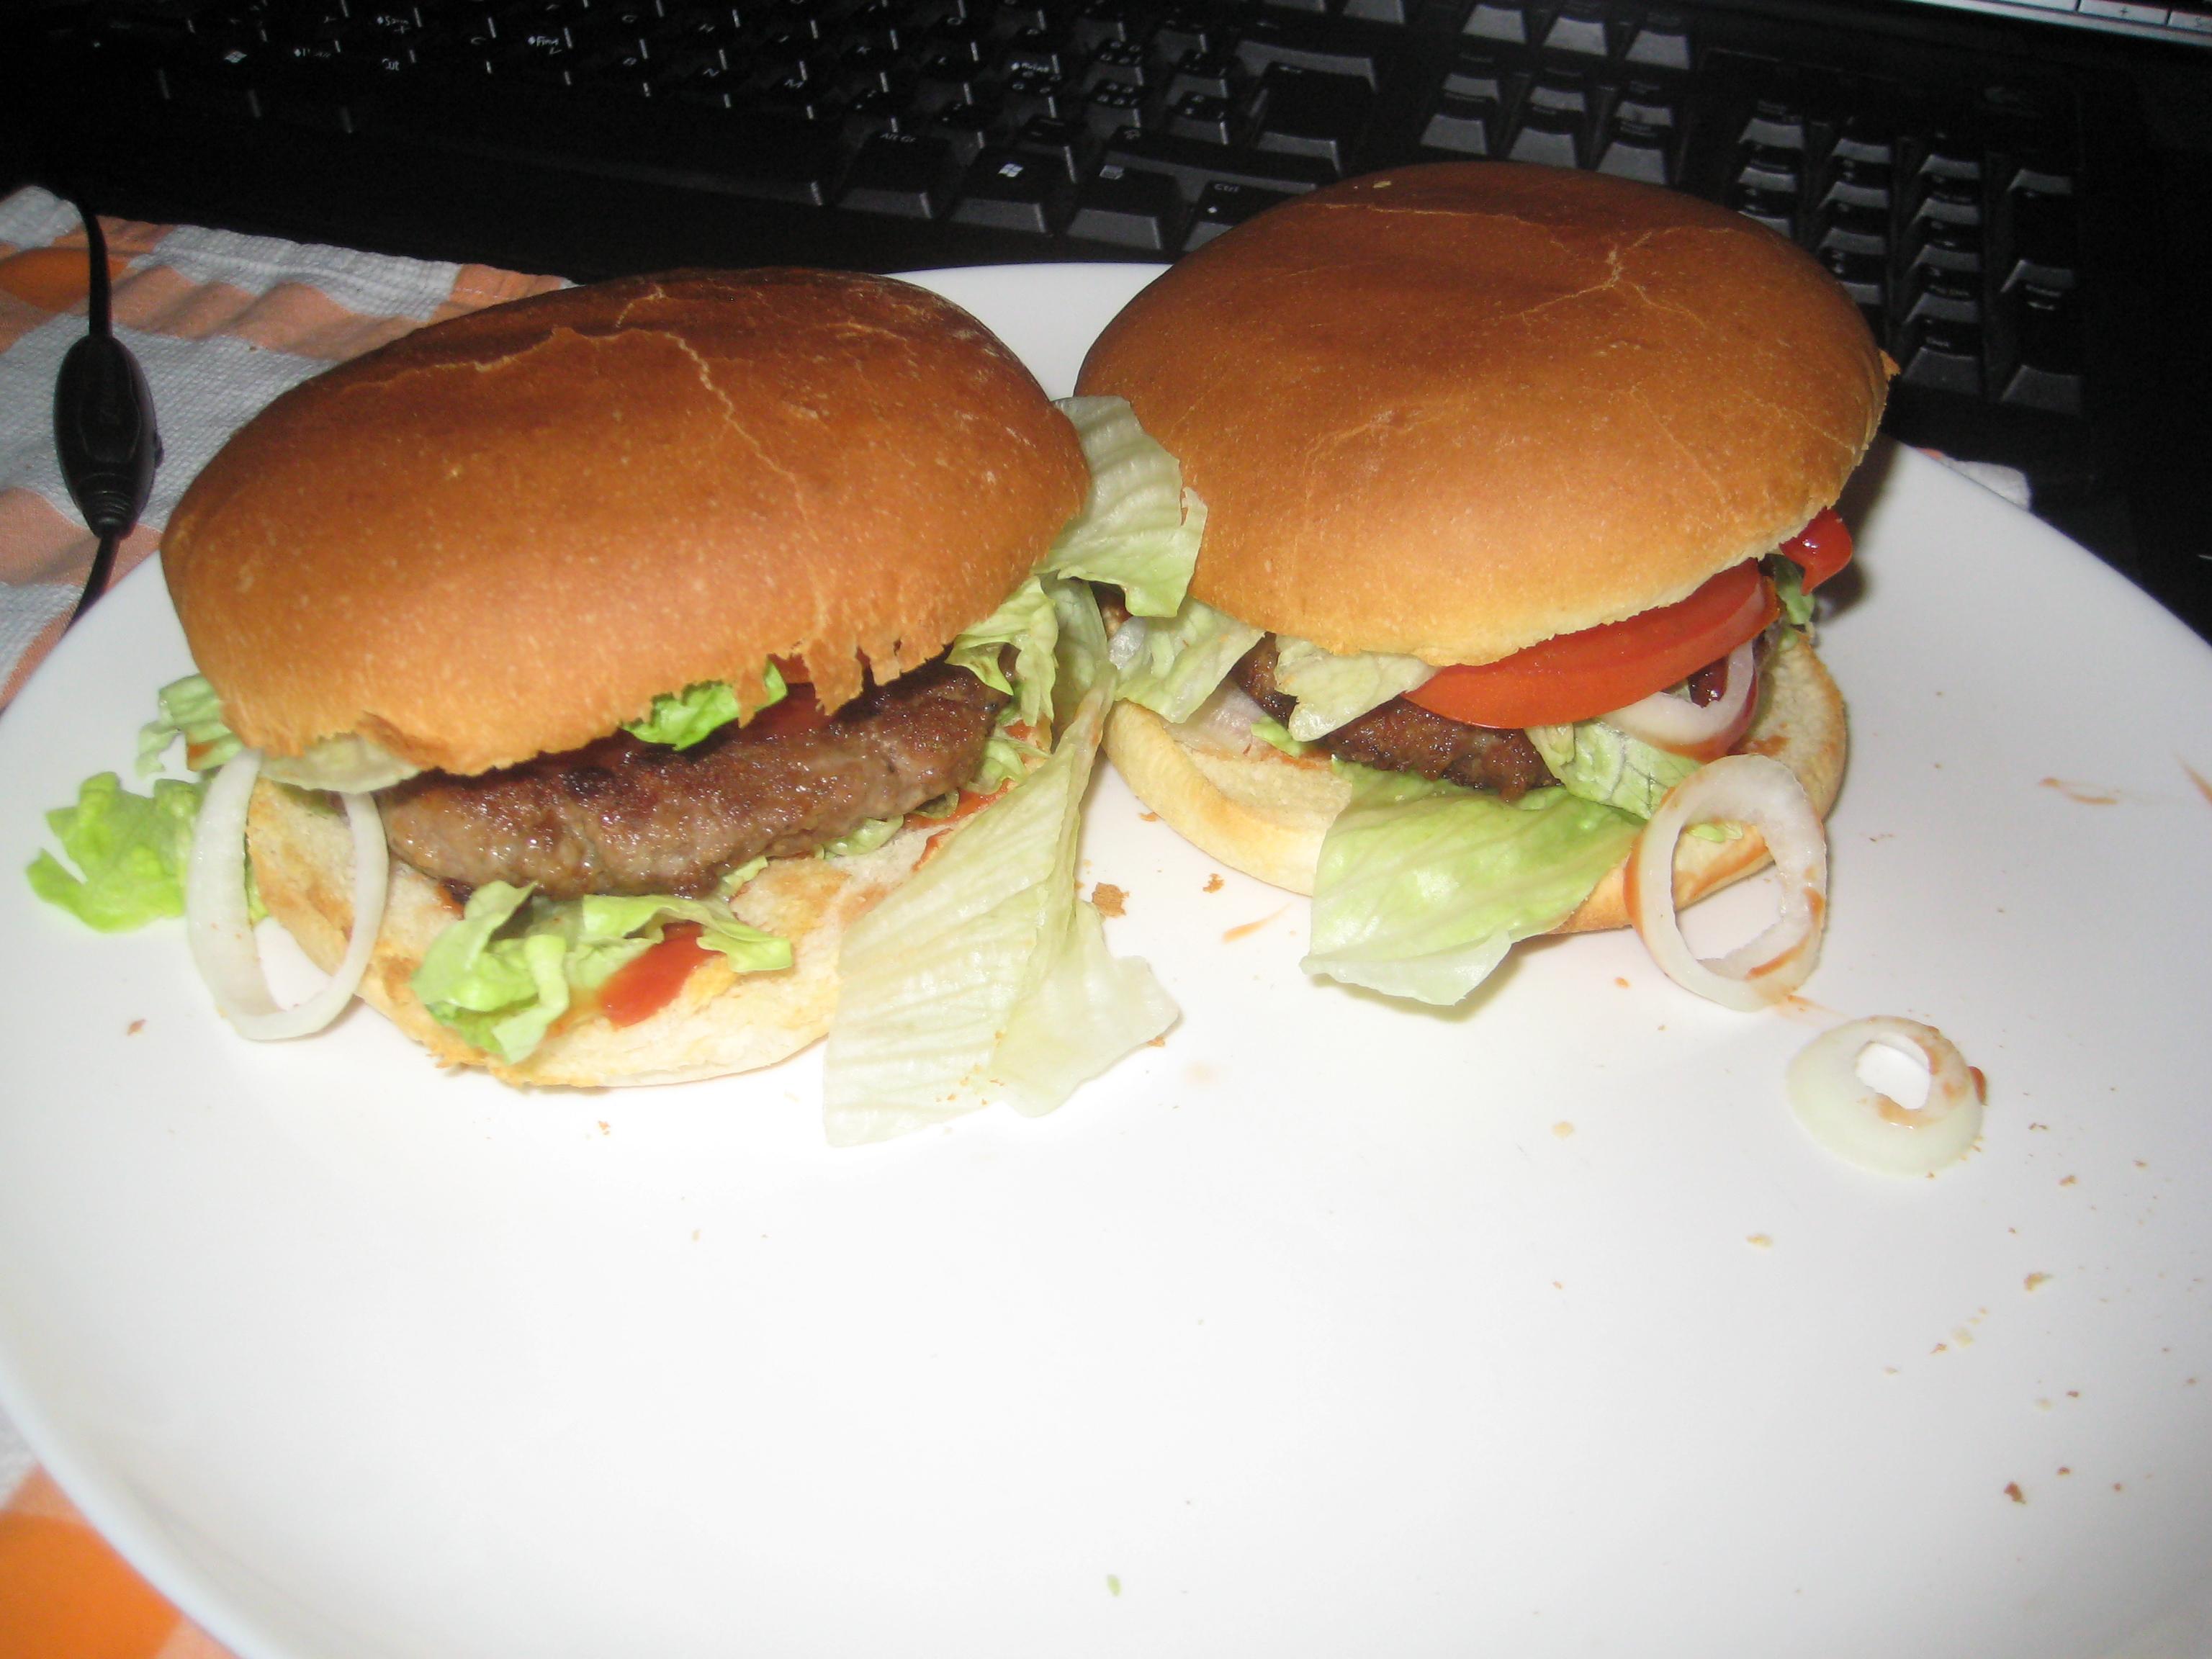 https://foodloader.net/s1mon_2009-01-07_hamburger.jpg